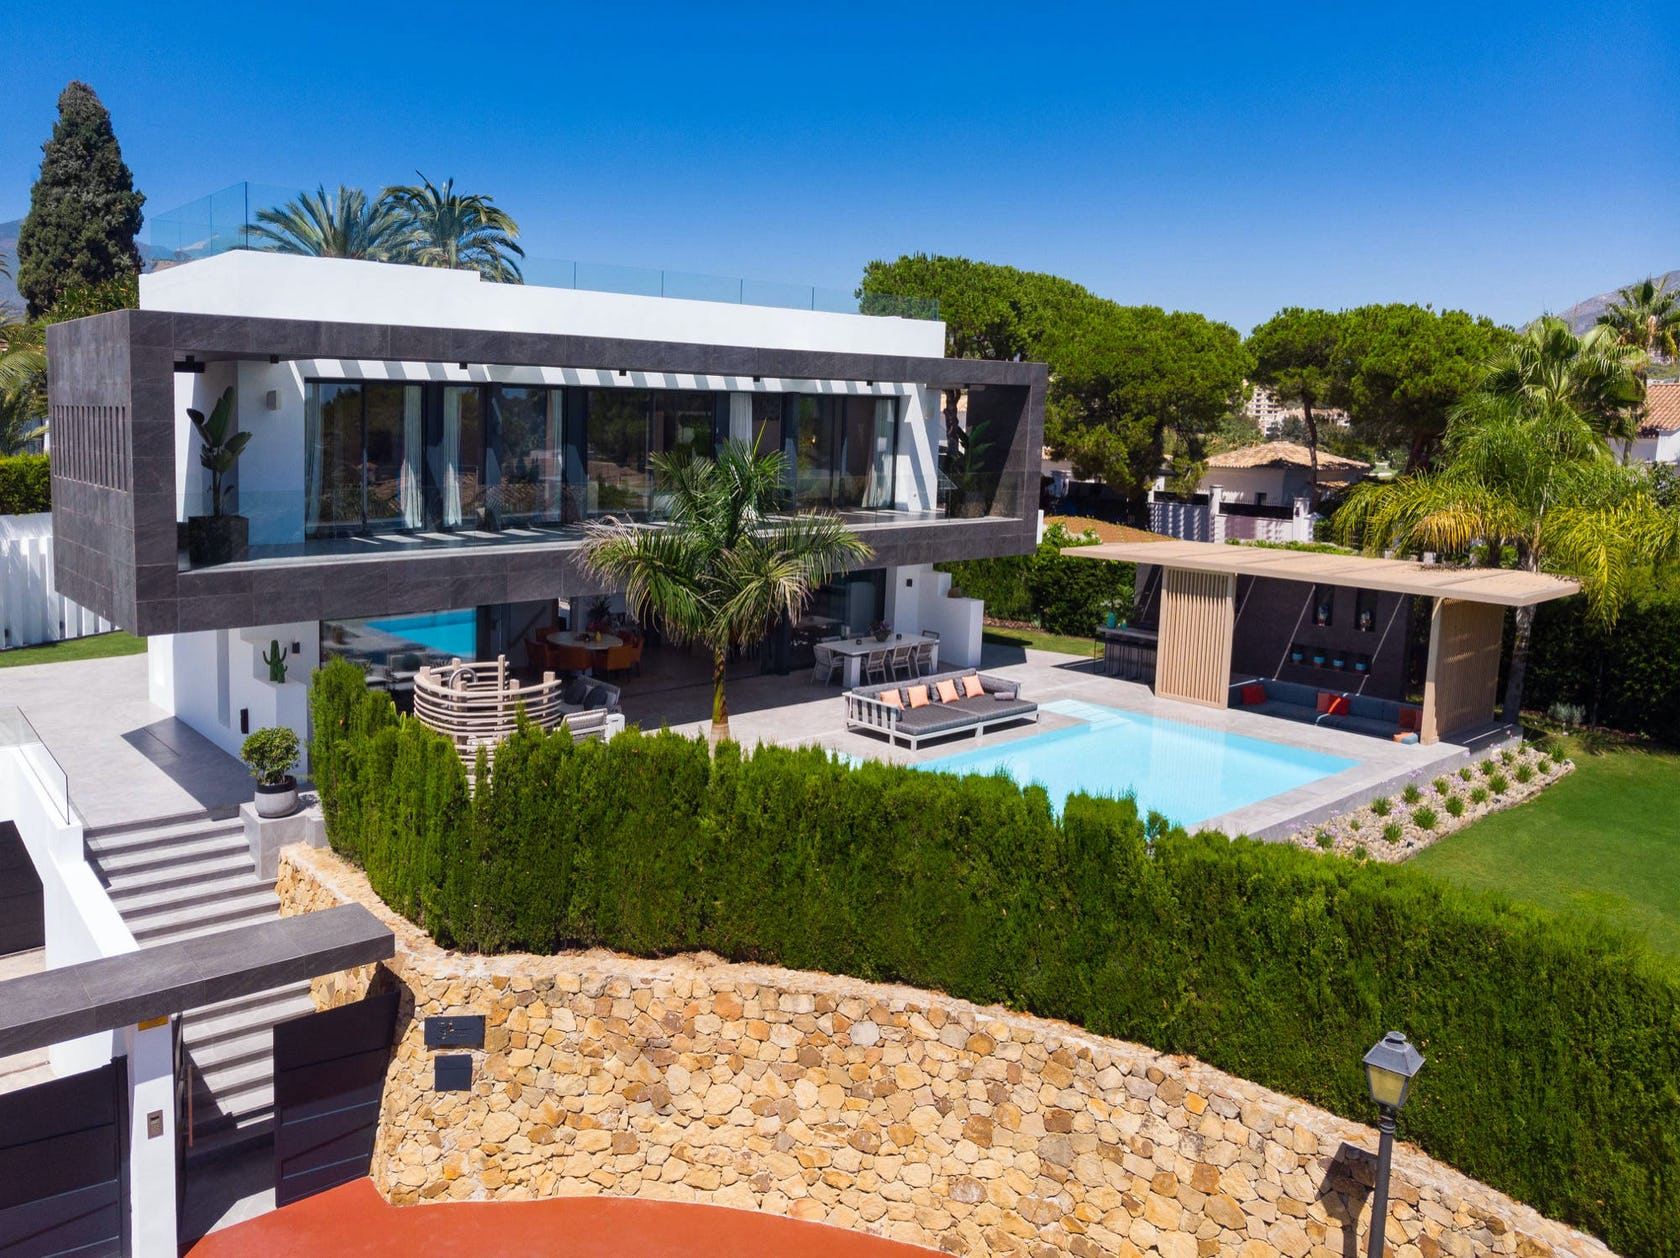 building villa house housing pool water outdoors hotel resort